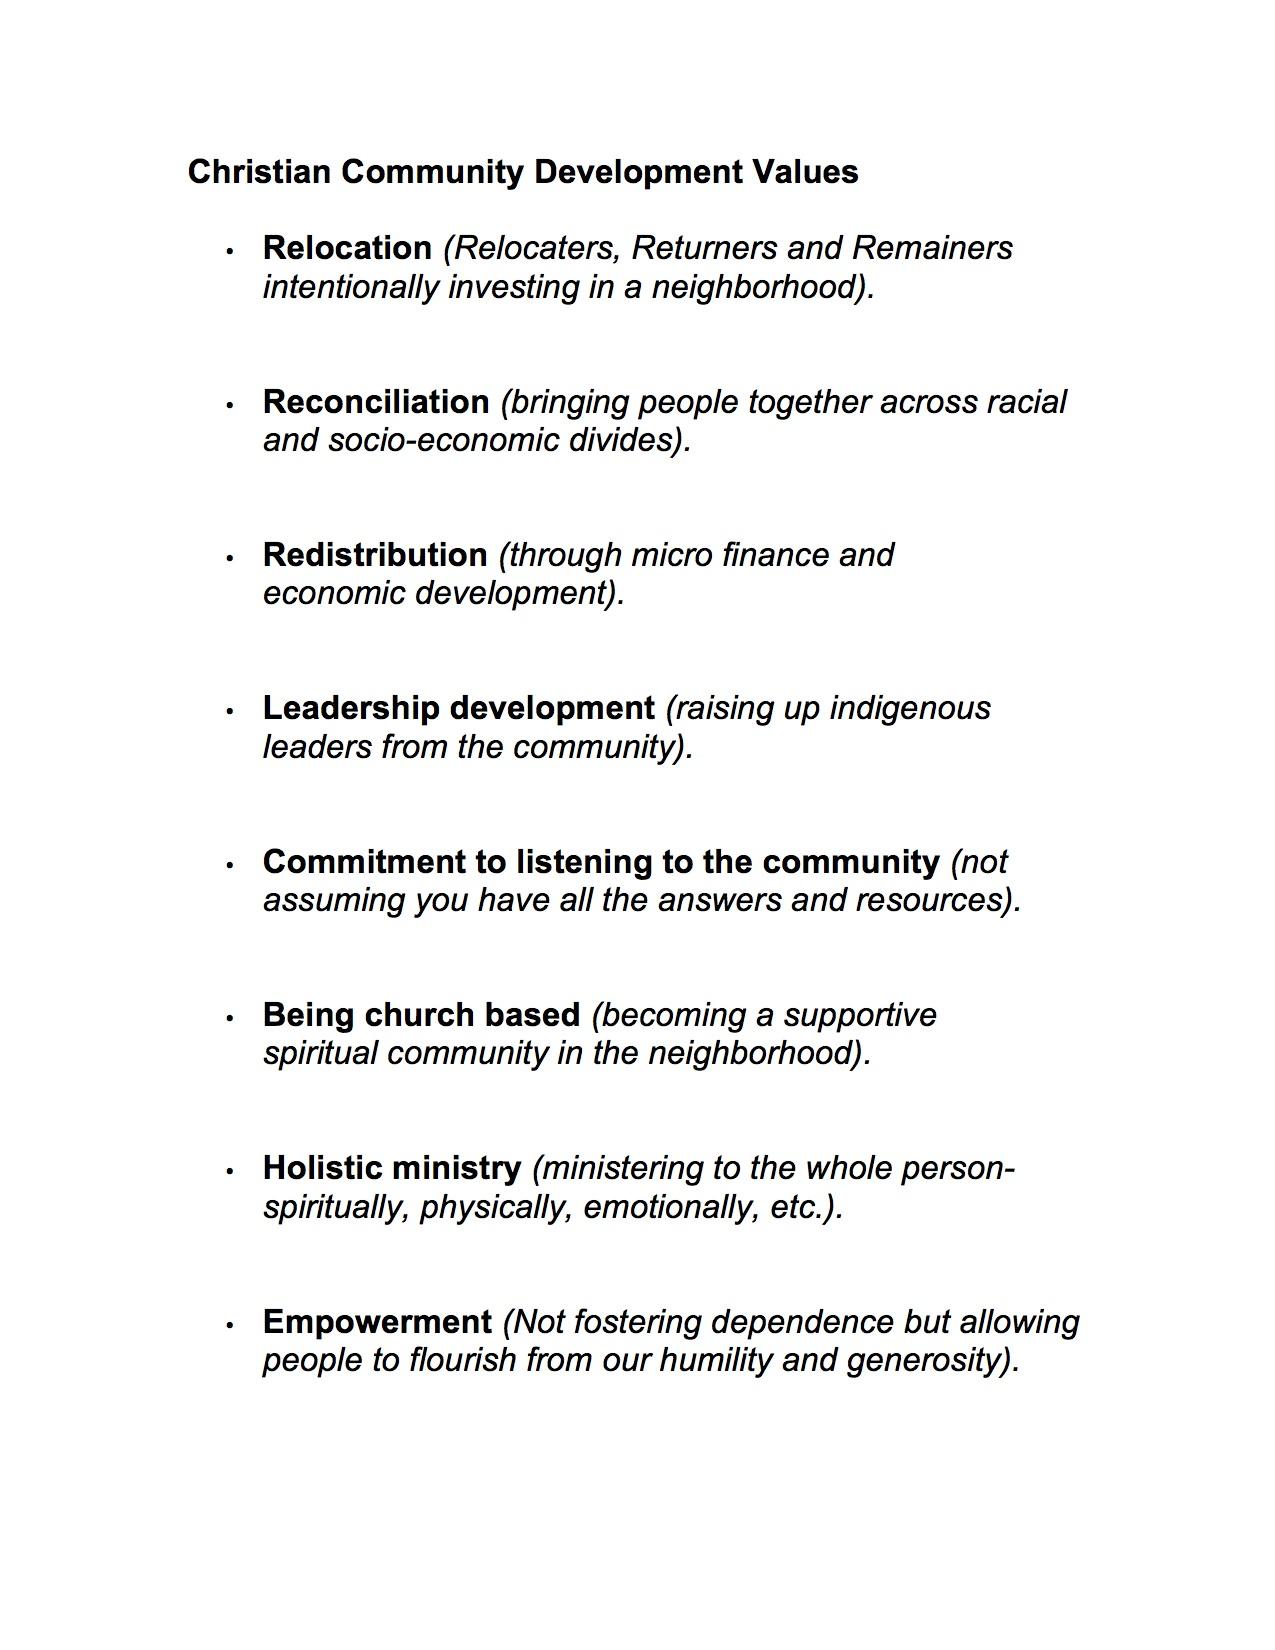 Christian Community Development Values.jpg